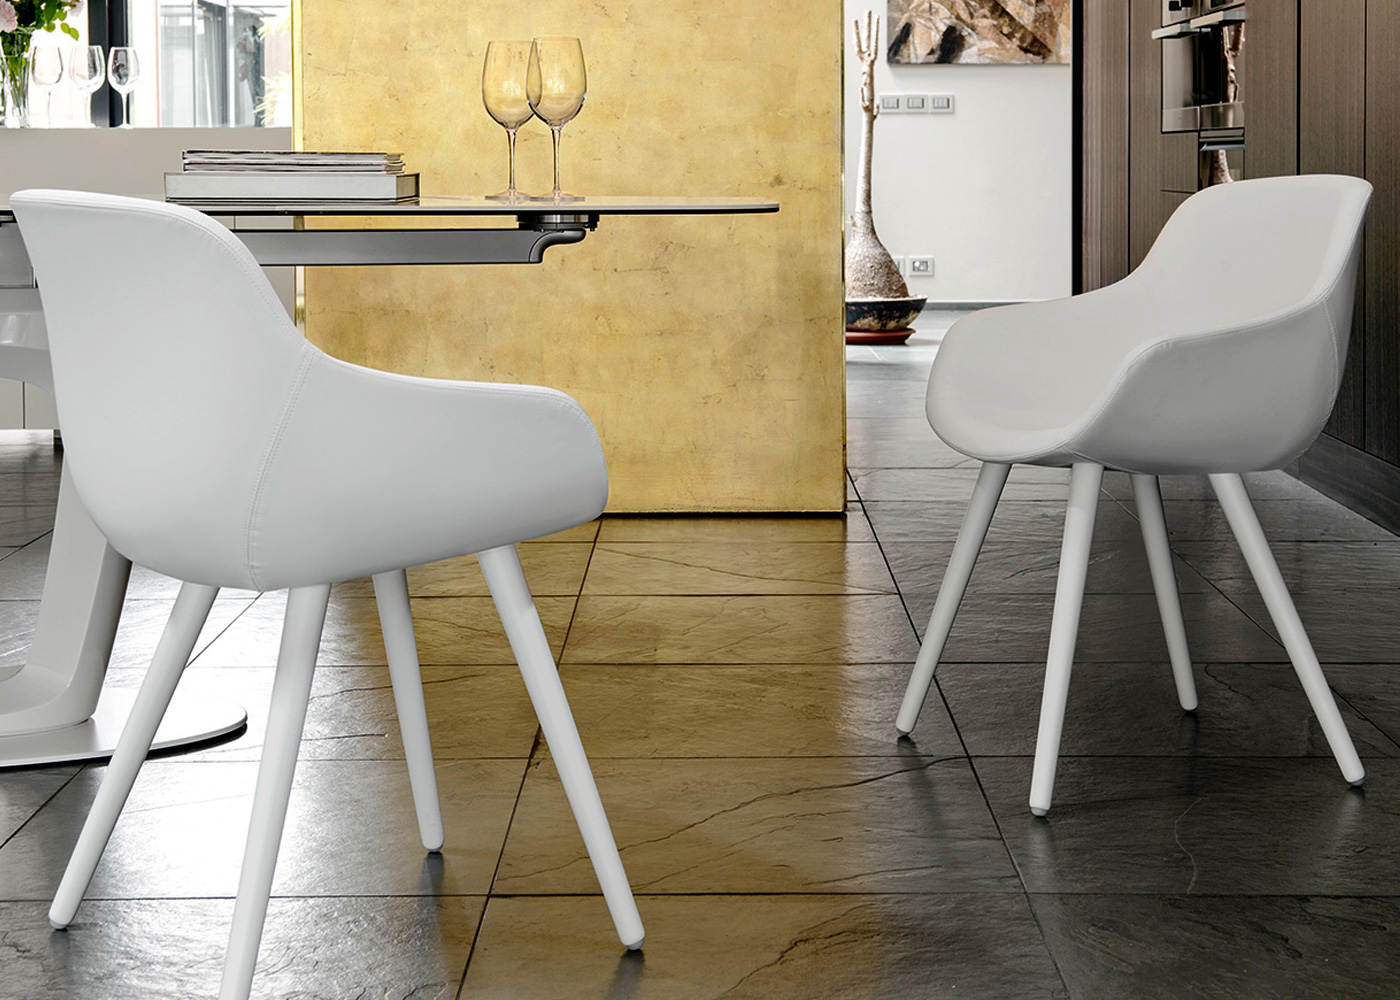 calligaris sofas uk make slipcover camel back sofa igloo chair midfurn furniture superstore